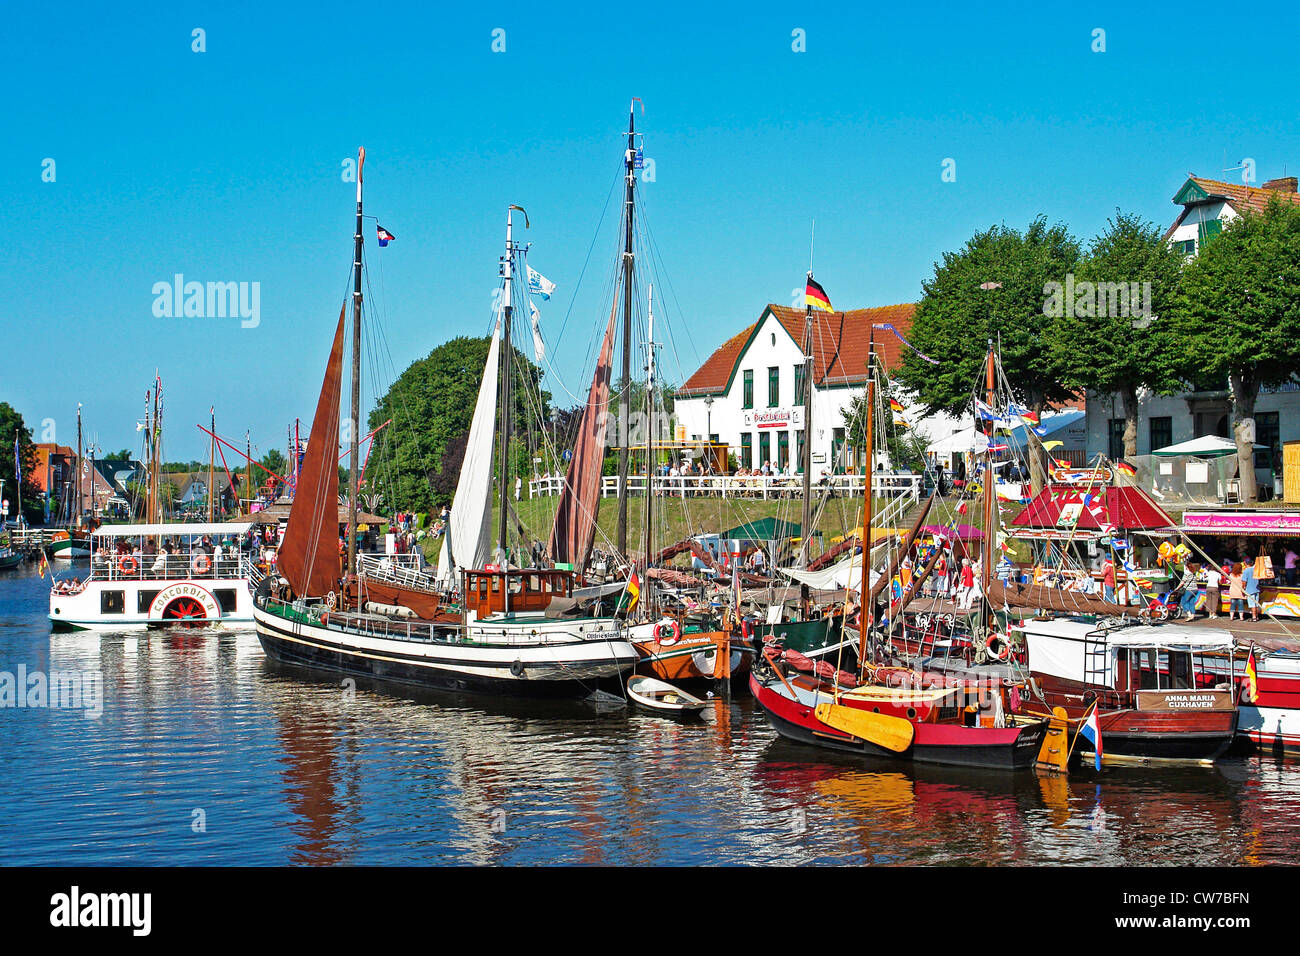 Carolinensiel Harbour - Stock Image